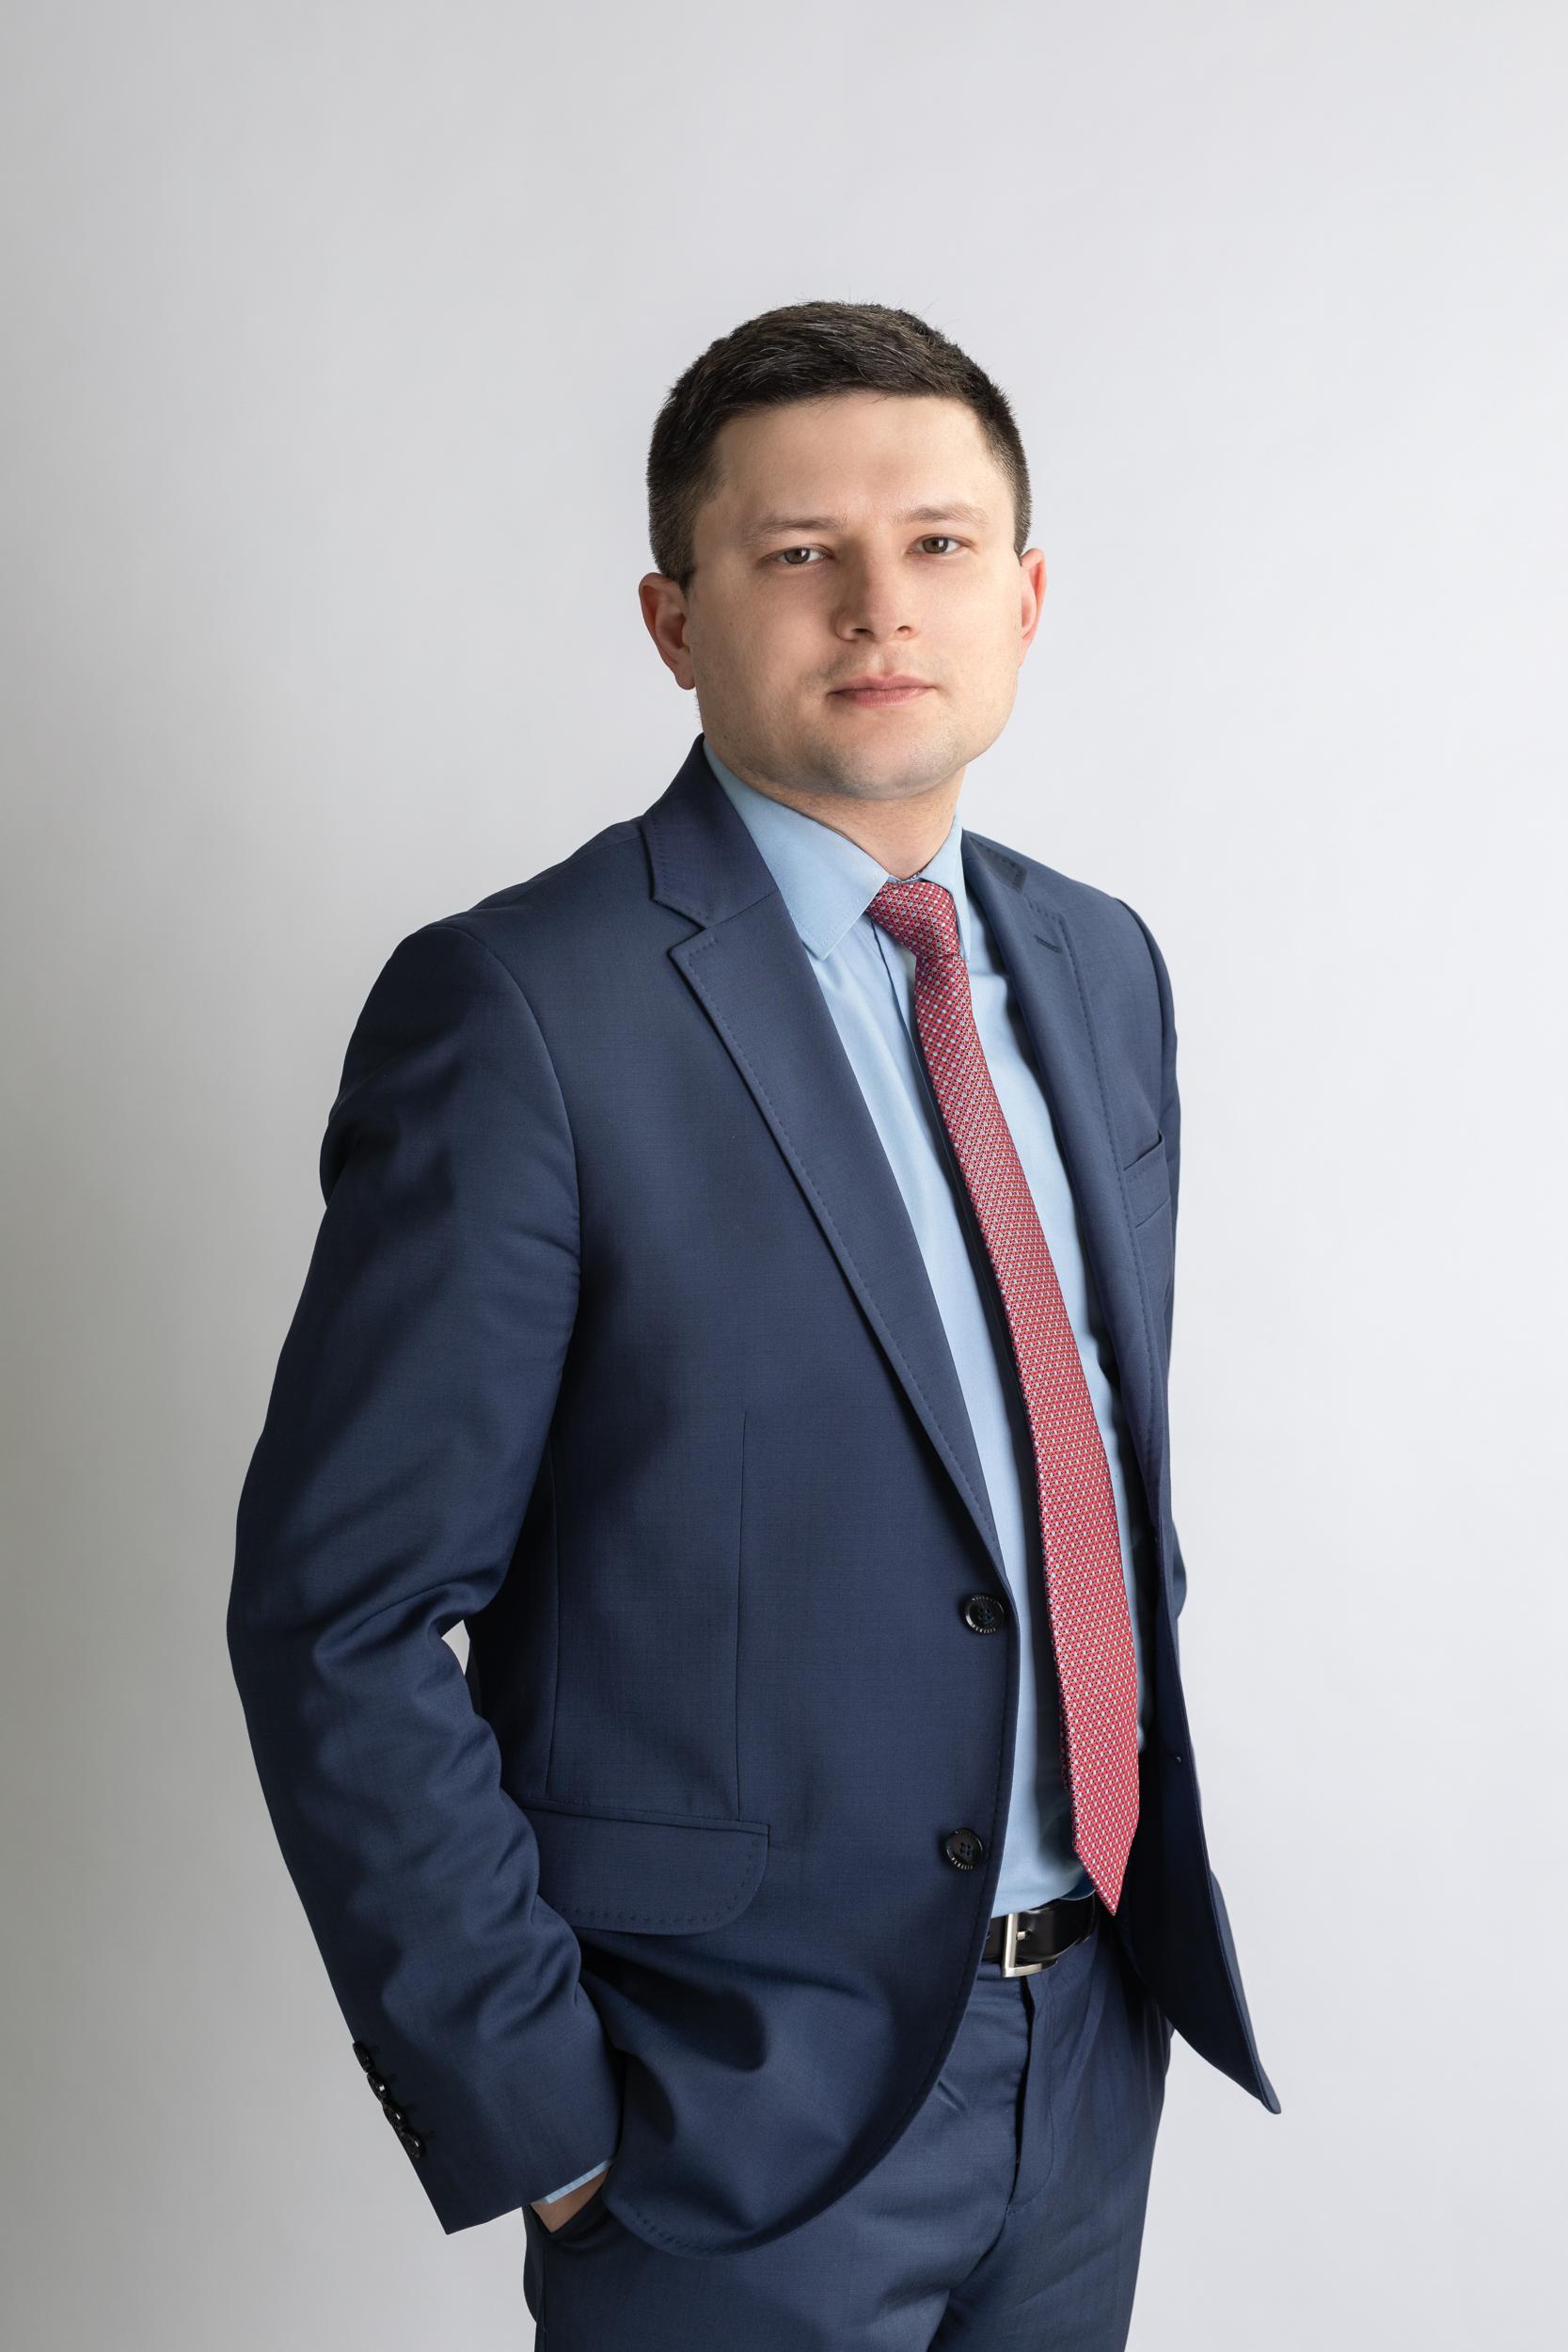 Jakub Pawliczak